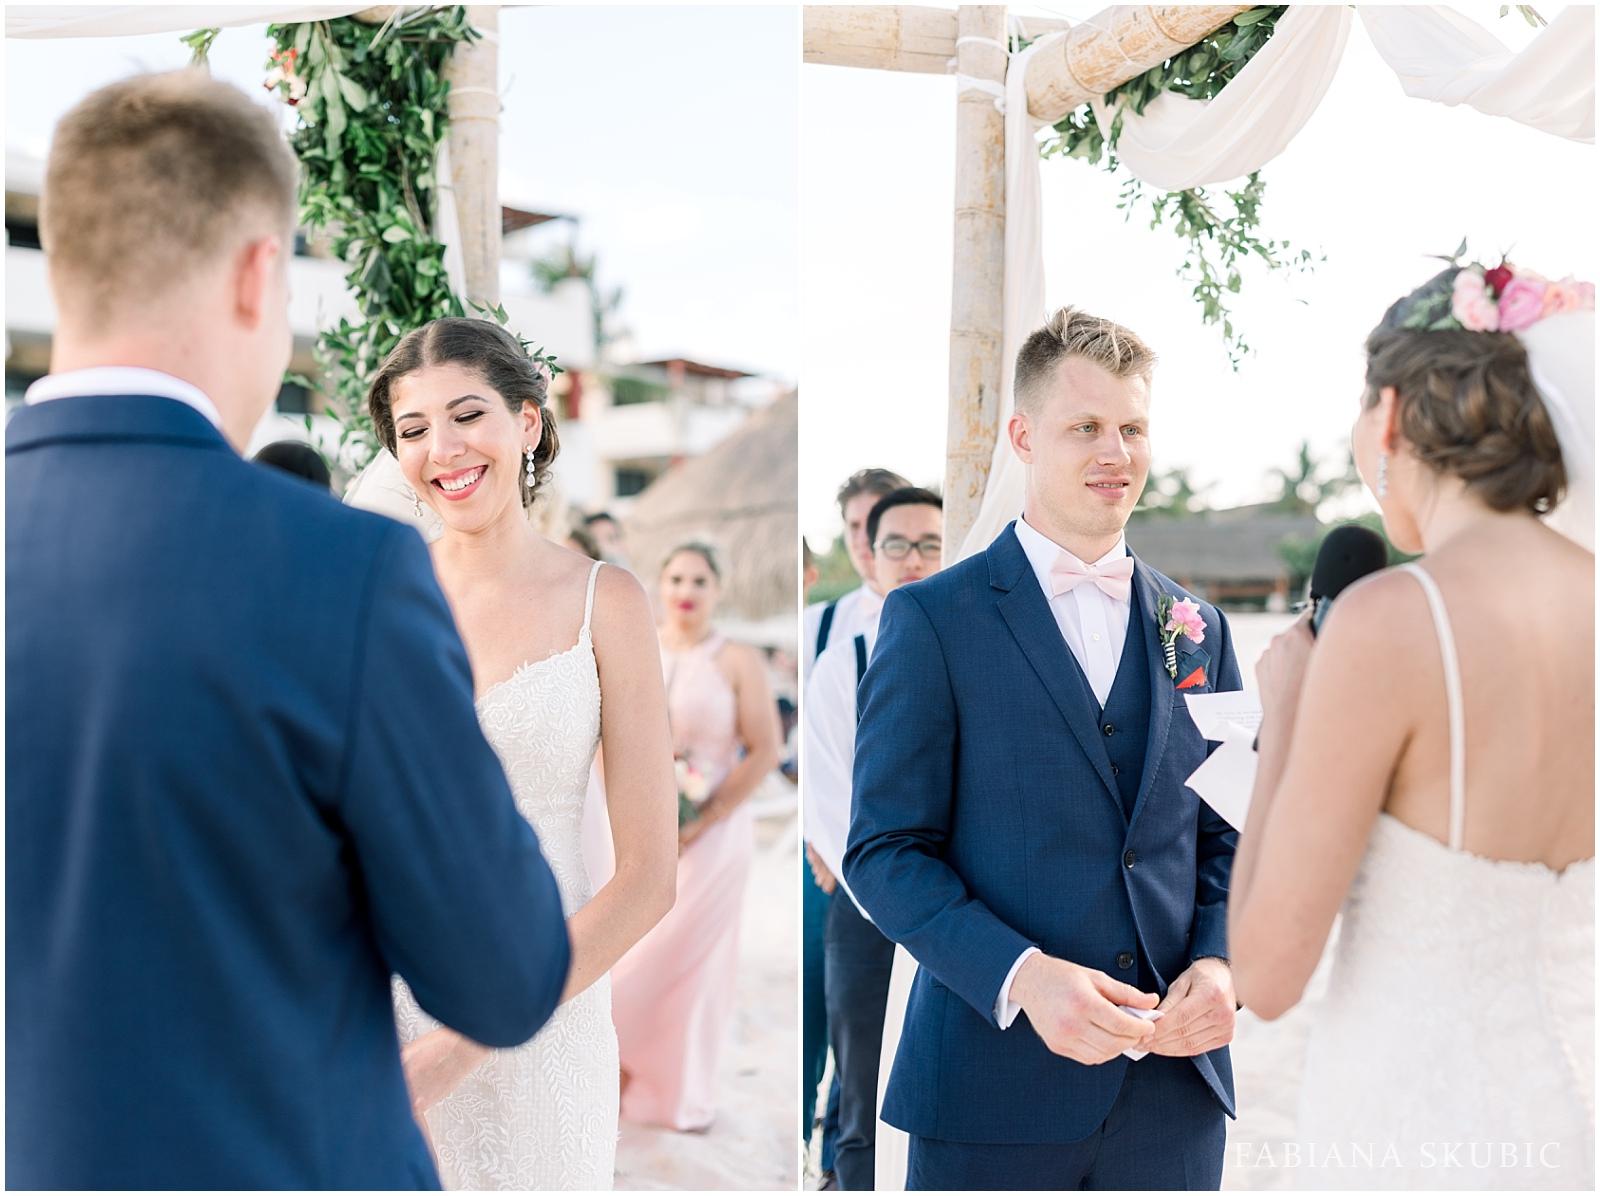 TJ_Now_Sapphire_Riviera_Cancun_Mexico_Wedding_Photos_0231.jpg